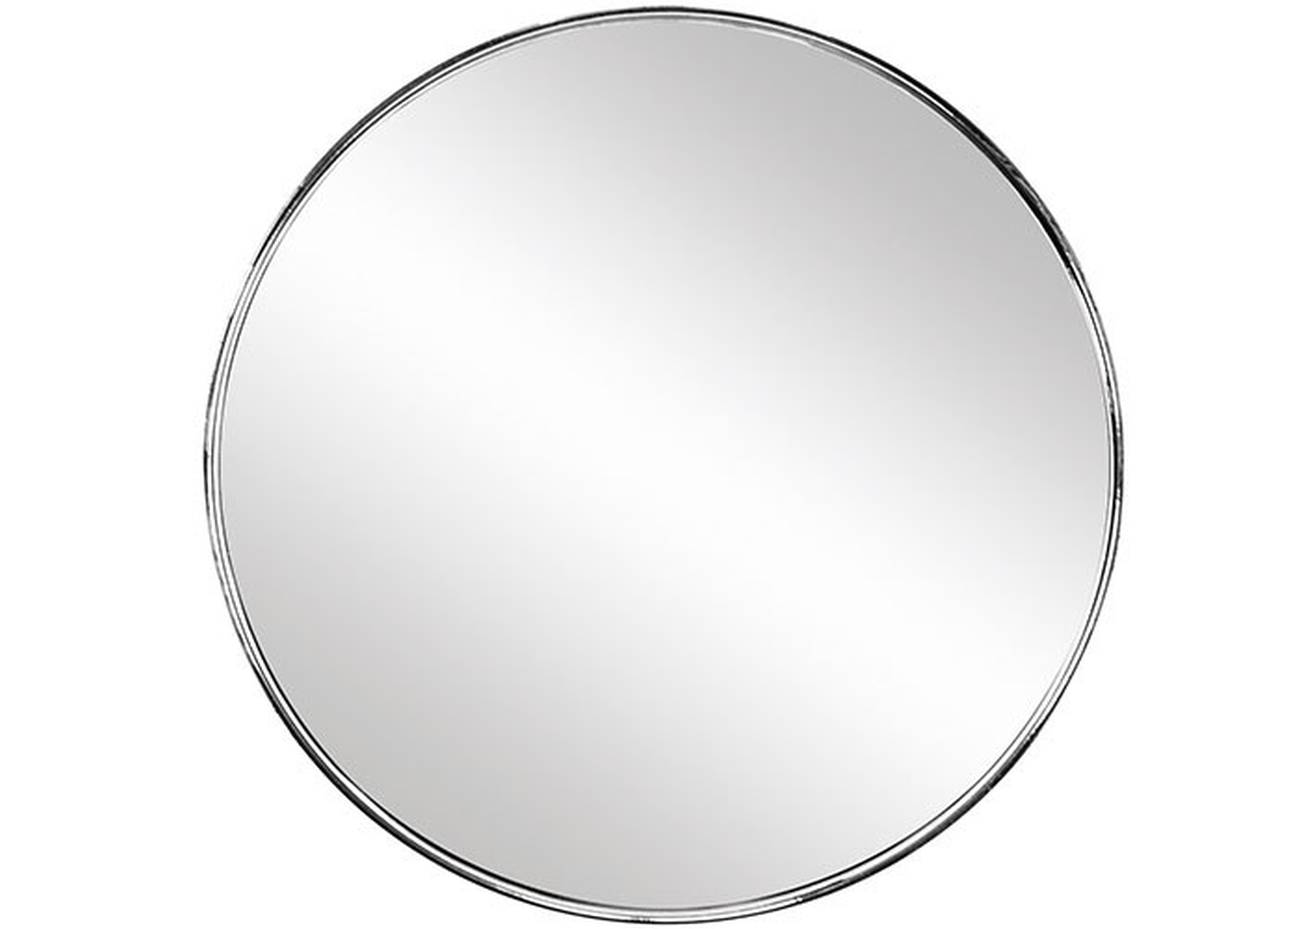 Kosmetikspiegel Mini Mirror EVA/Glas Silber Spiegel